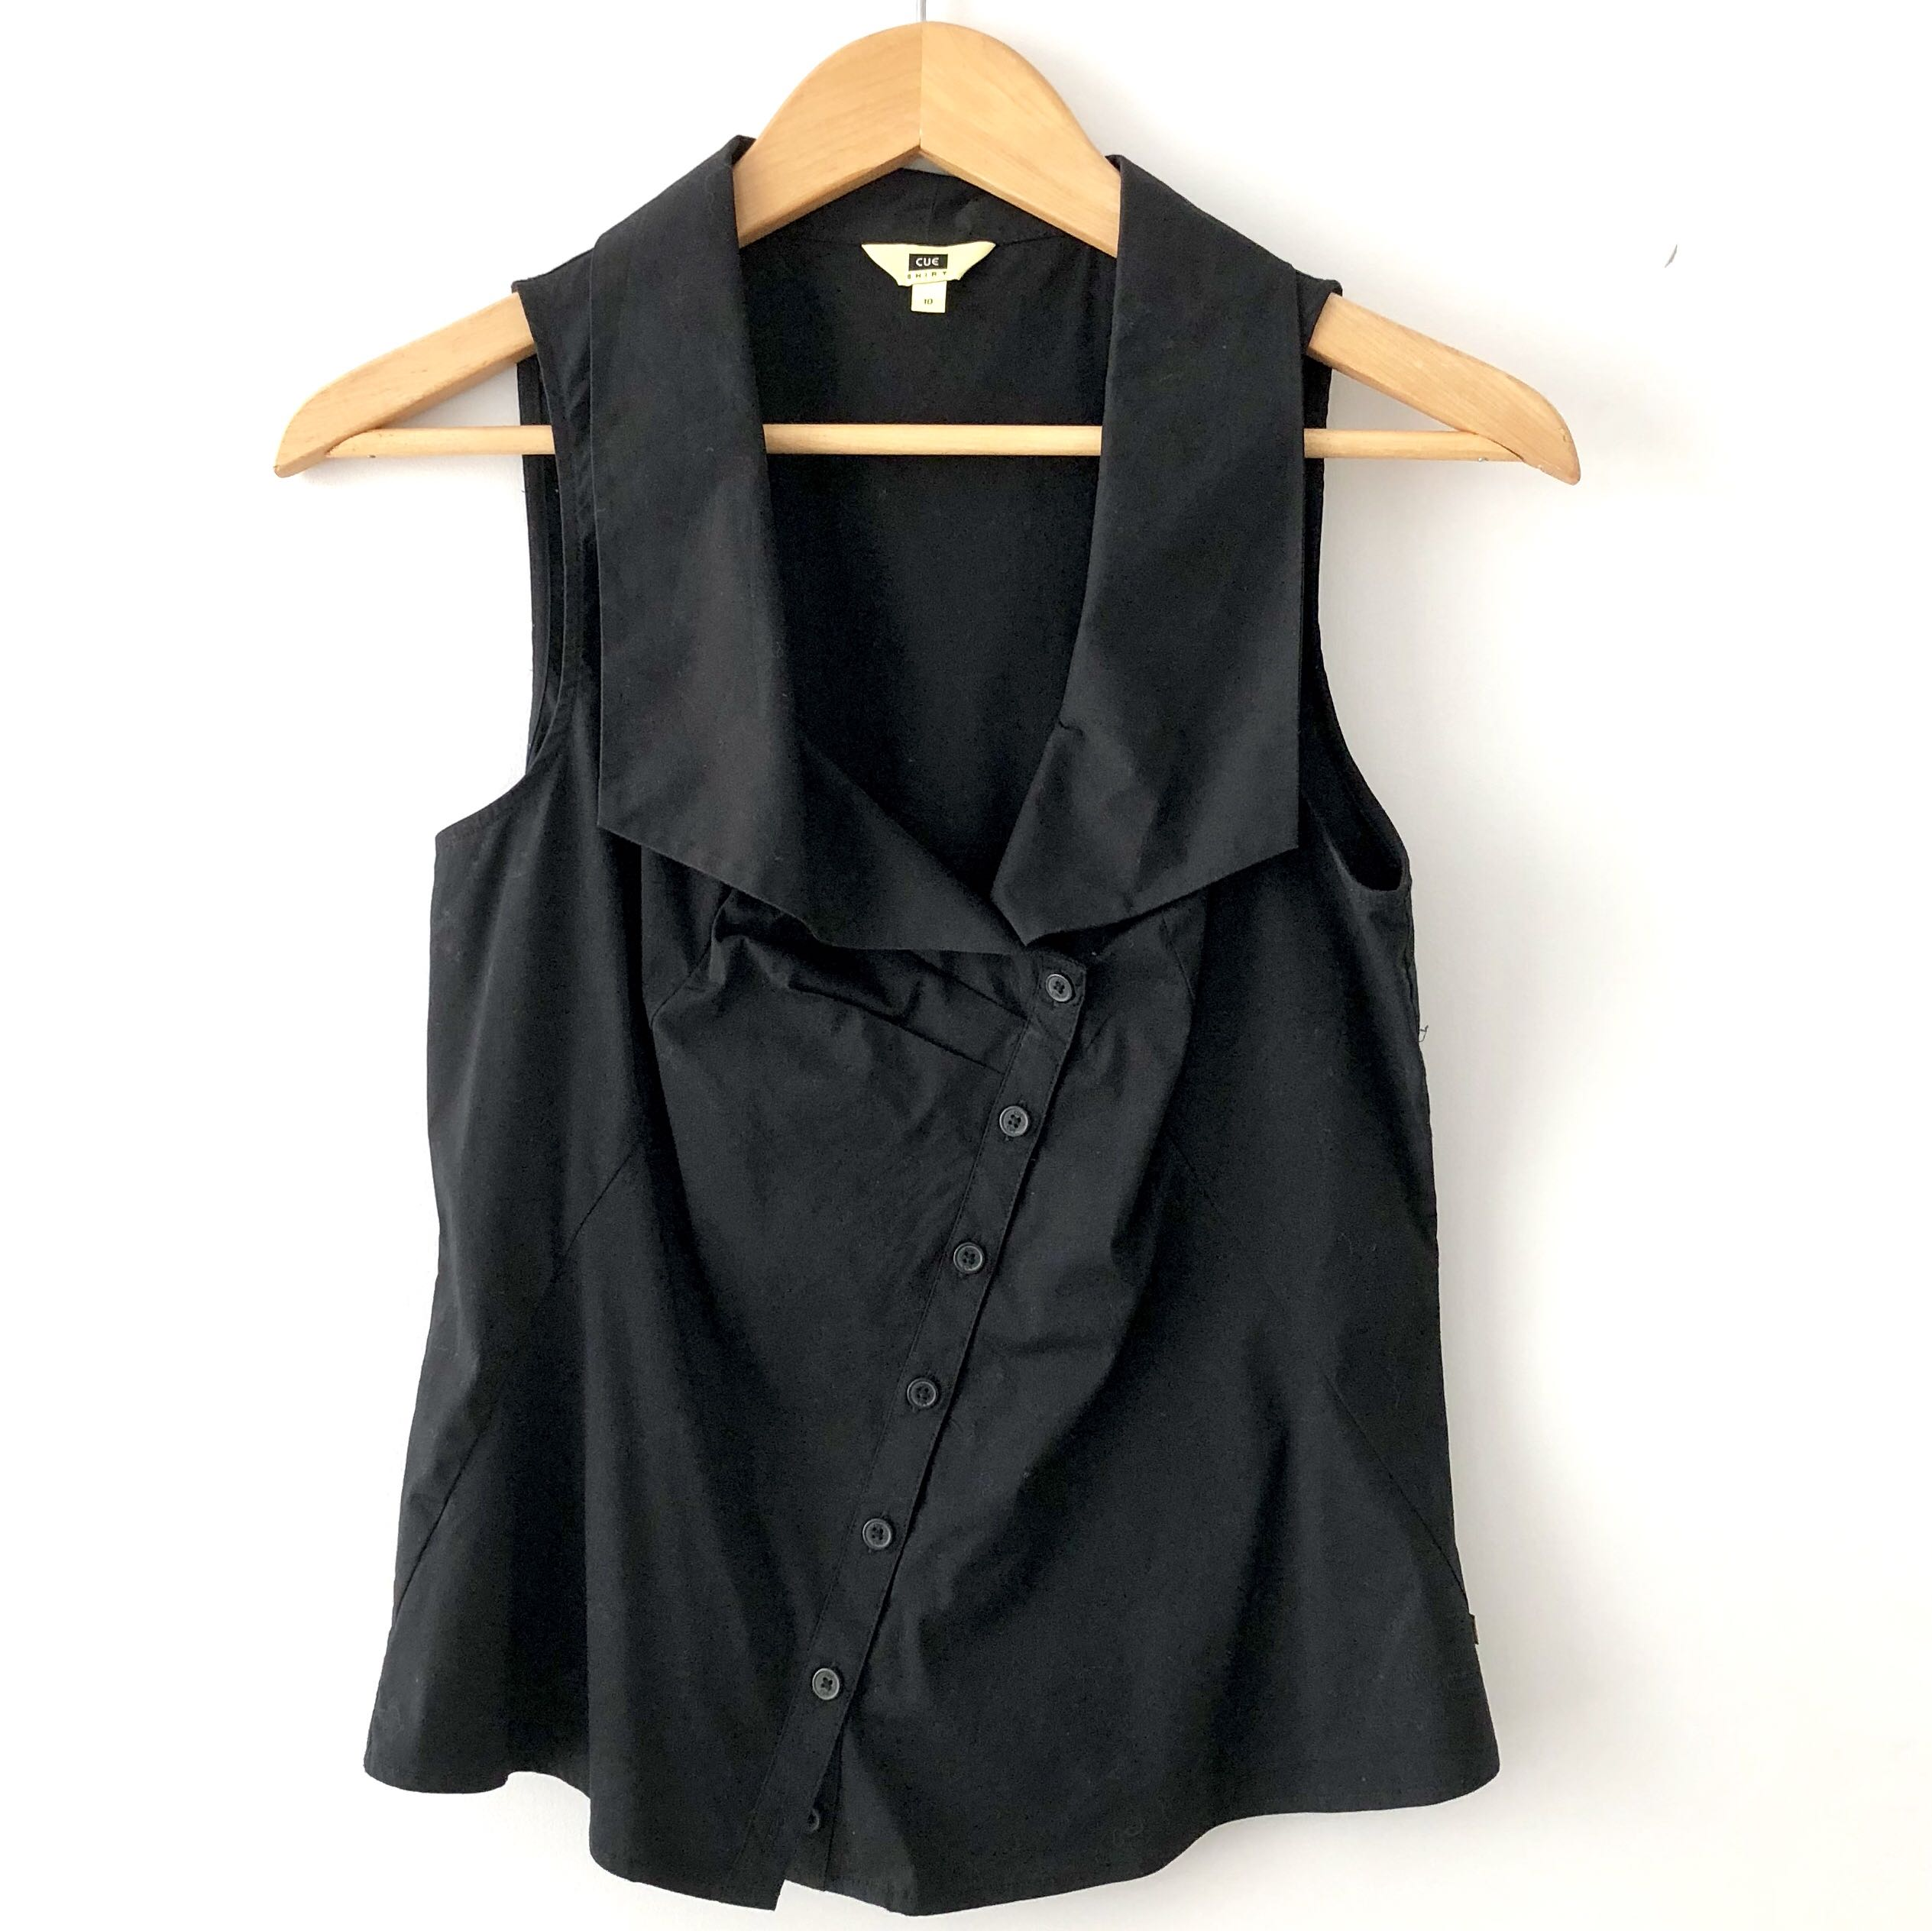 Cue asymmetrical button up sleeveless blouse / shirt in black